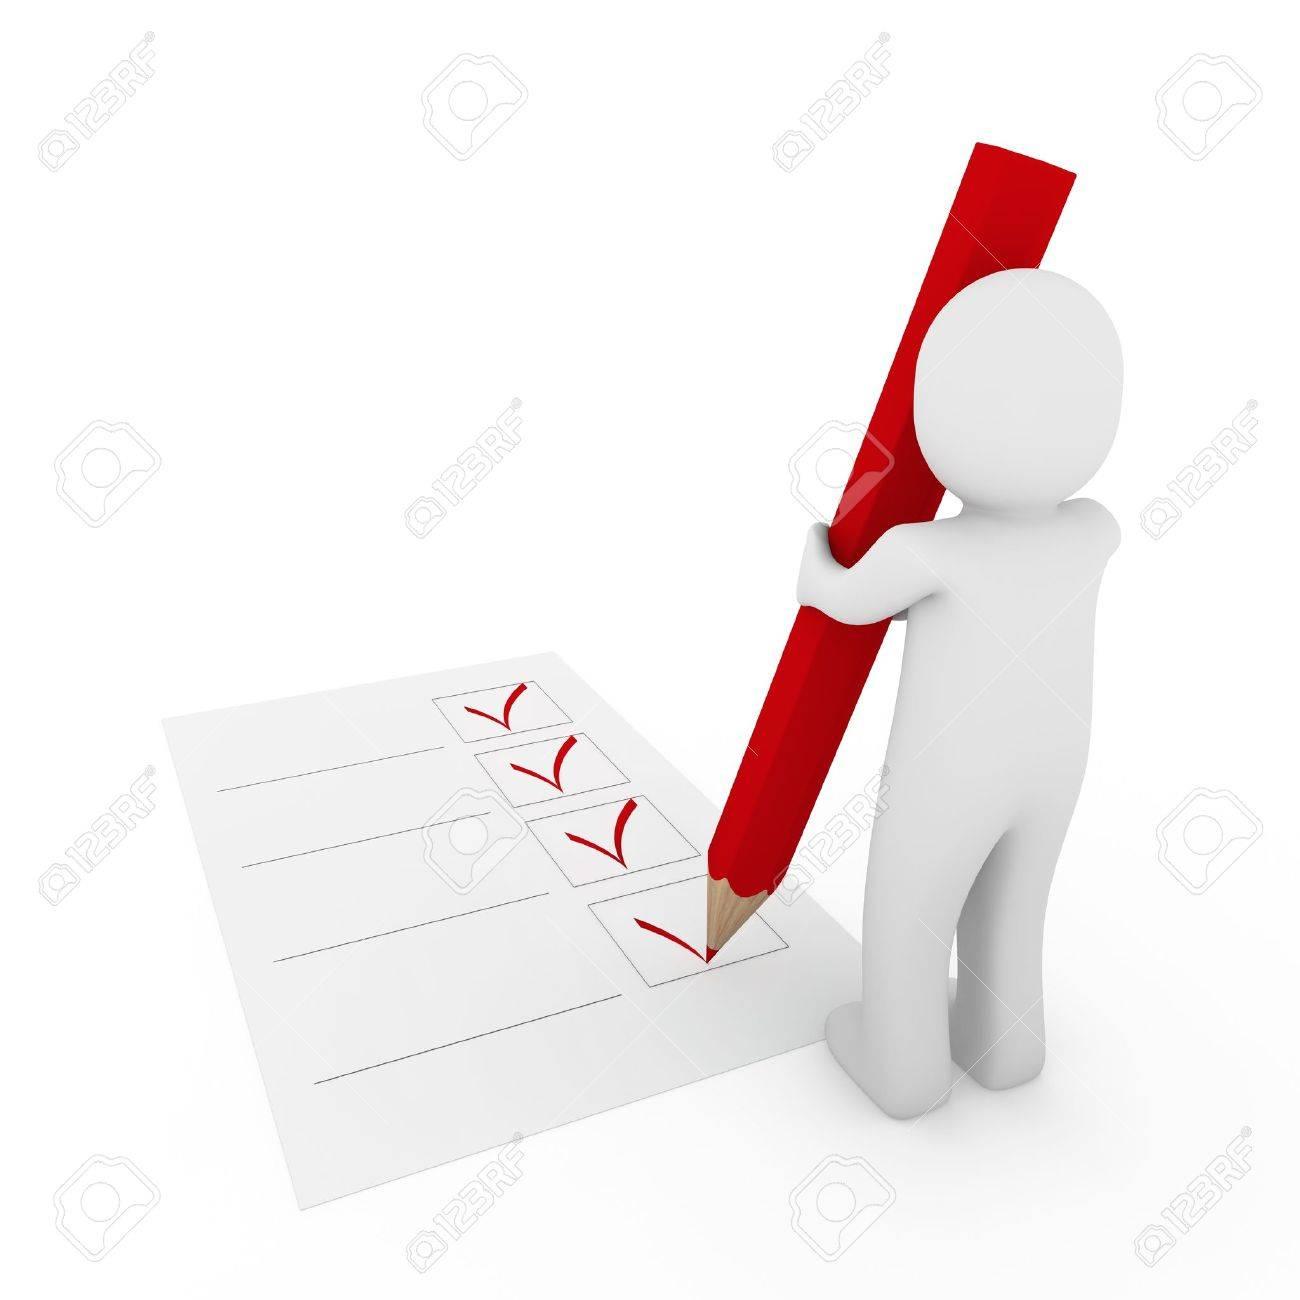 3d human check box paper pen pencil red Stock Photo - 8919327